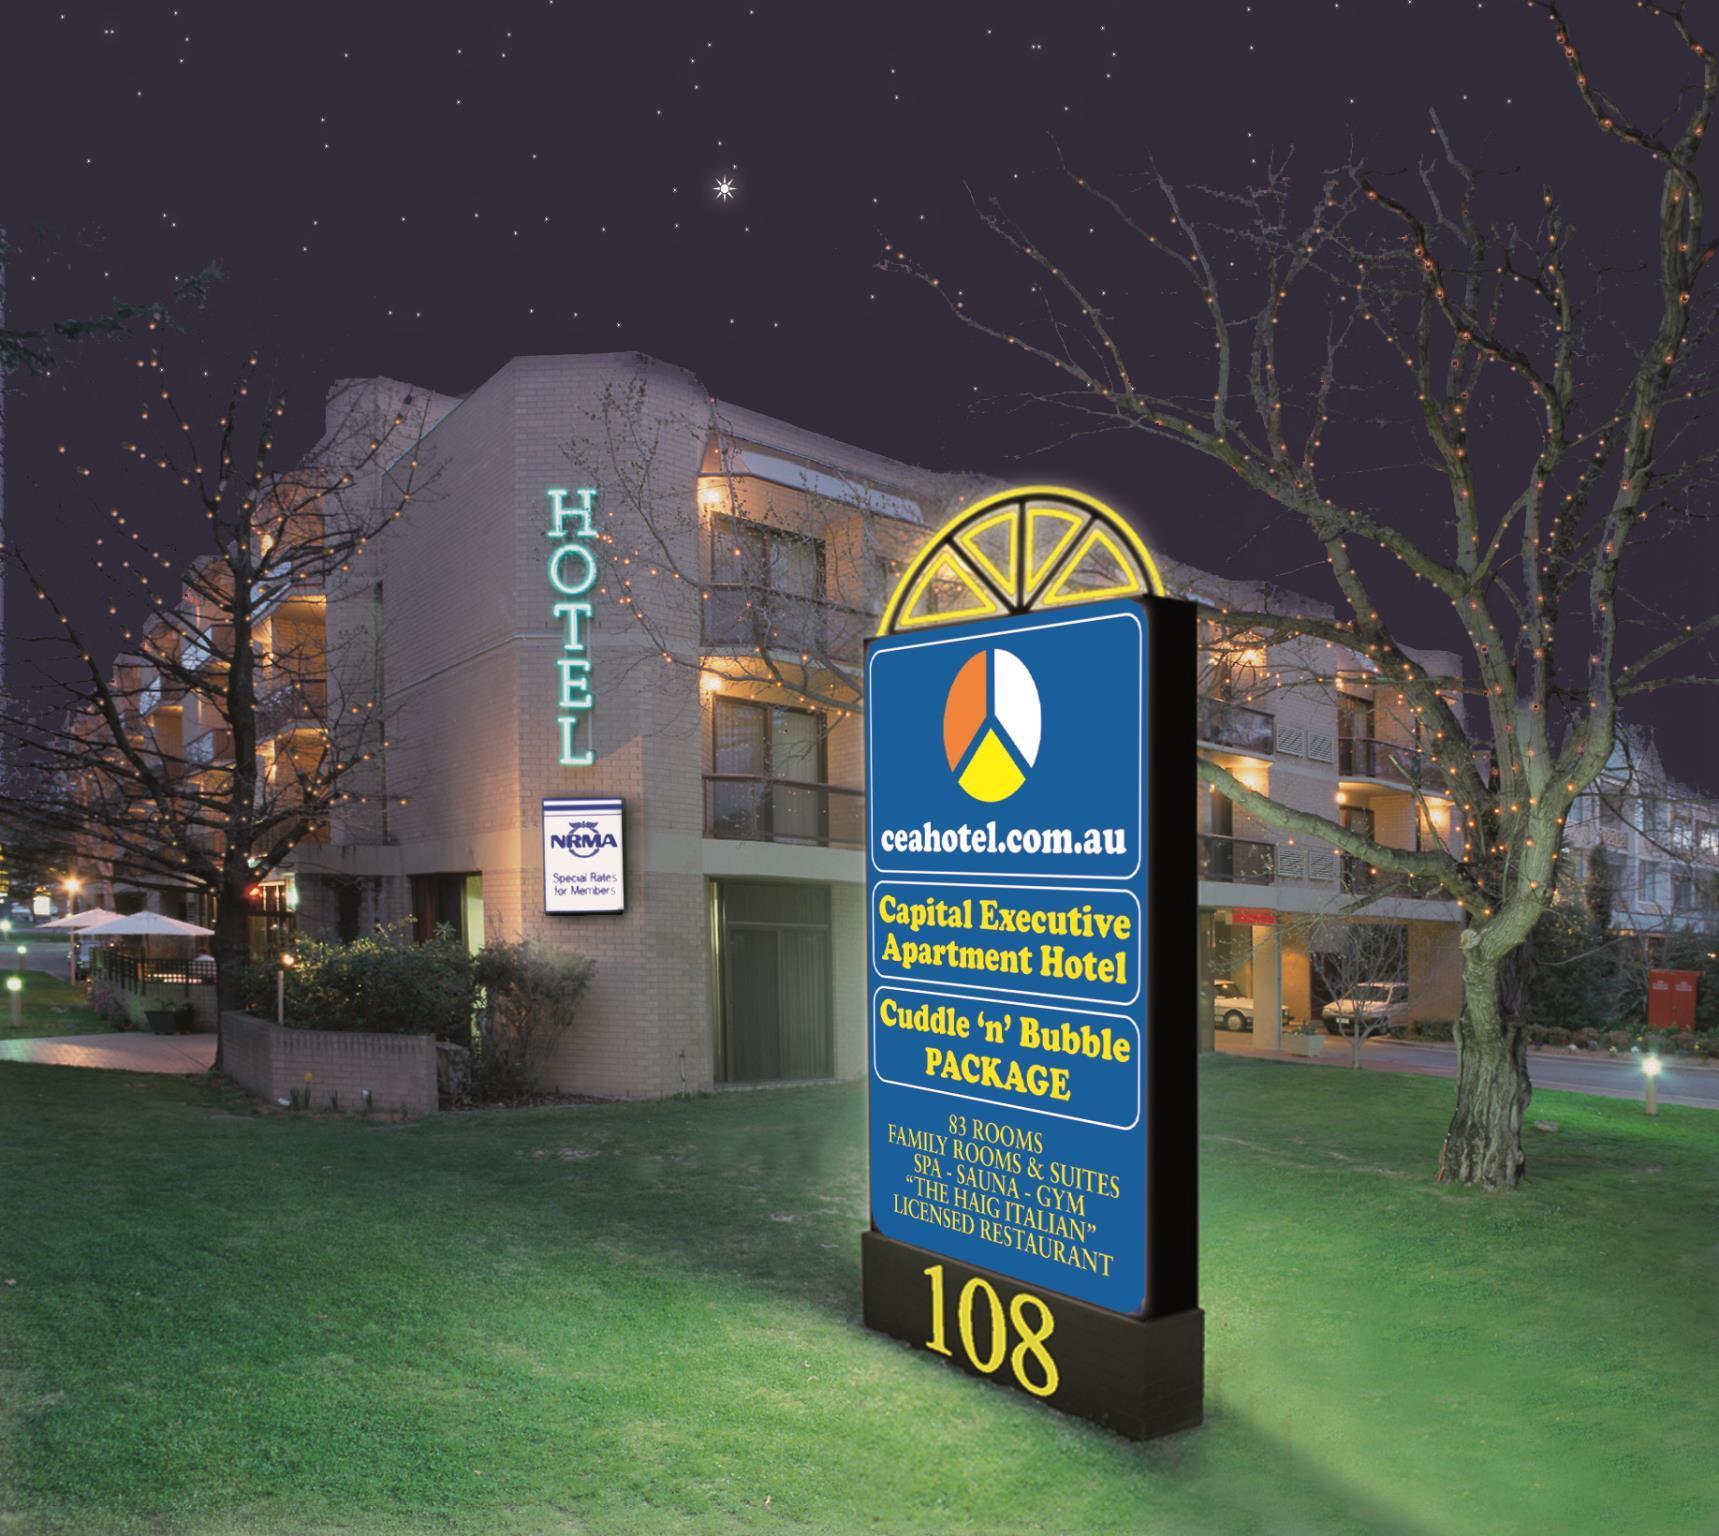 Madison Capital Executive Apartment Hotel